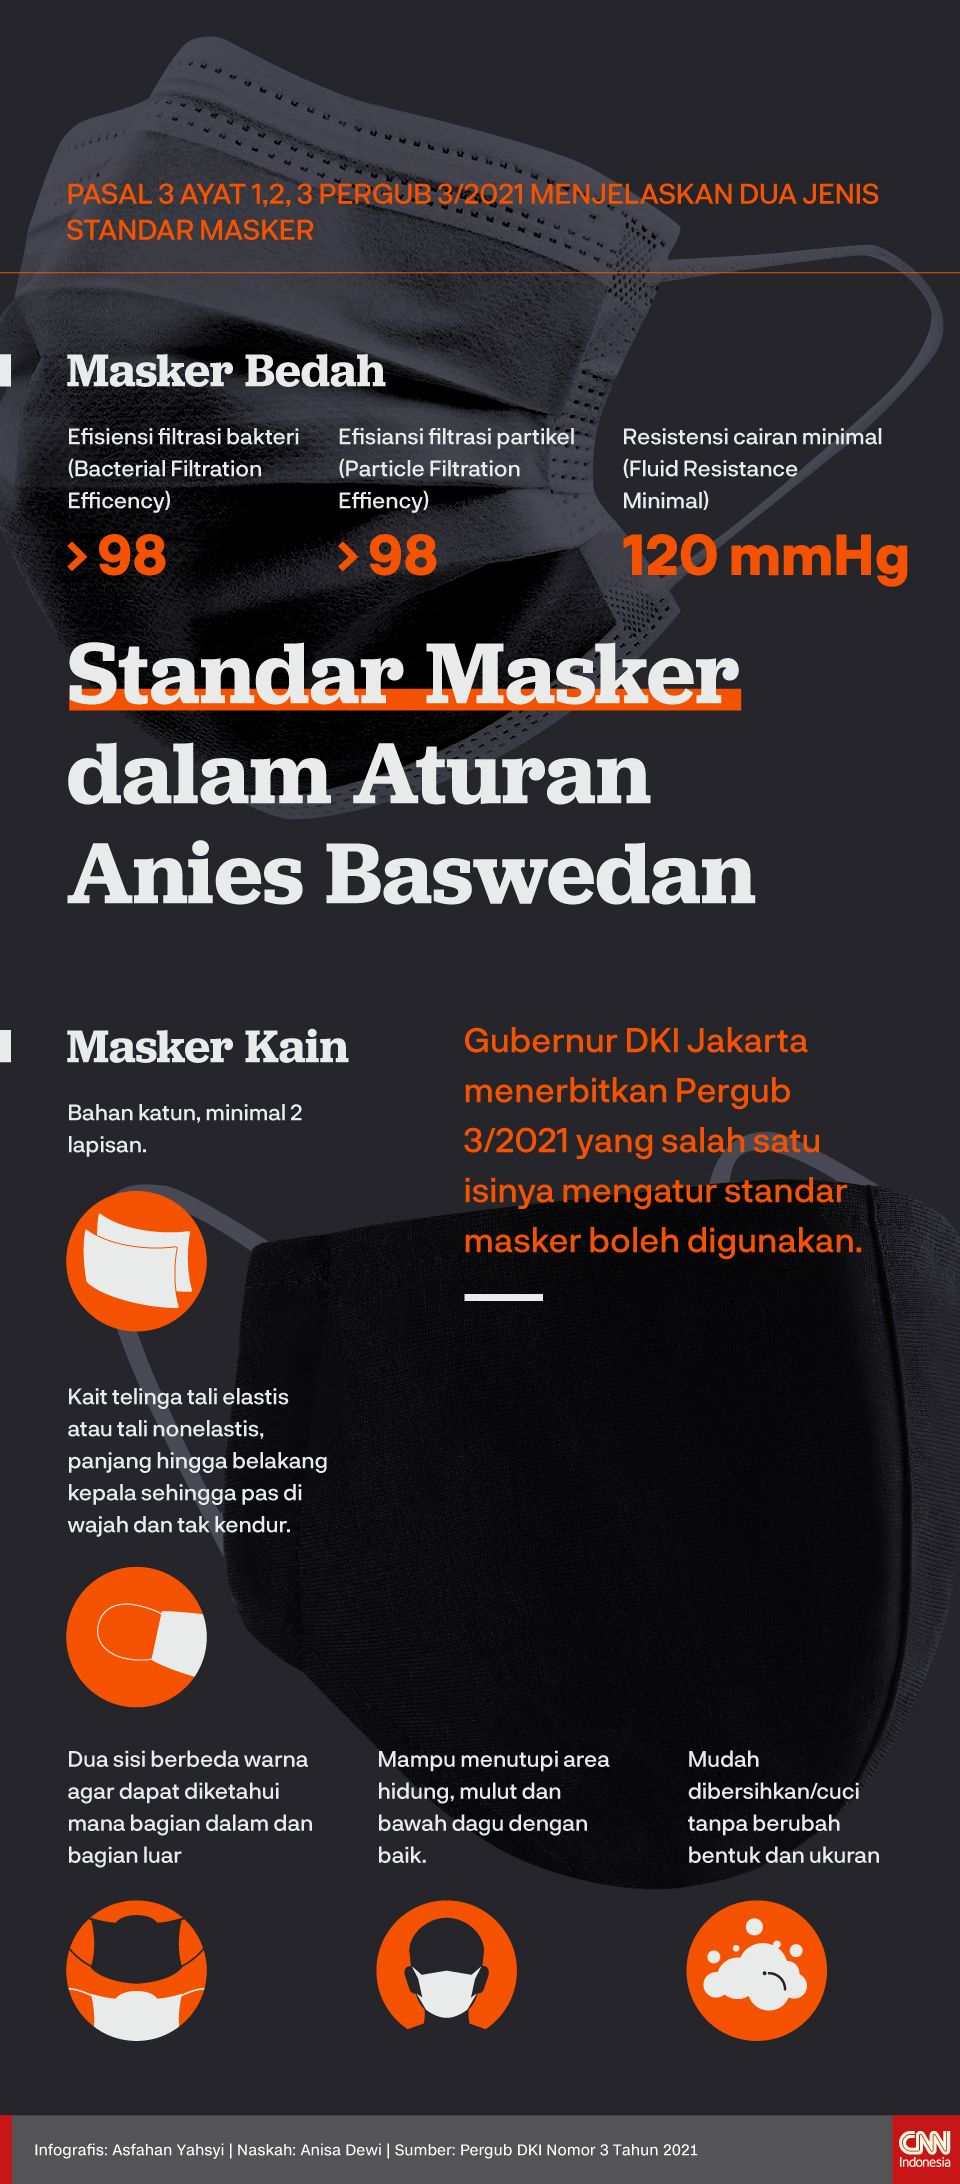 Infografis Standar Masker dalam Aturan Anies Baswedan